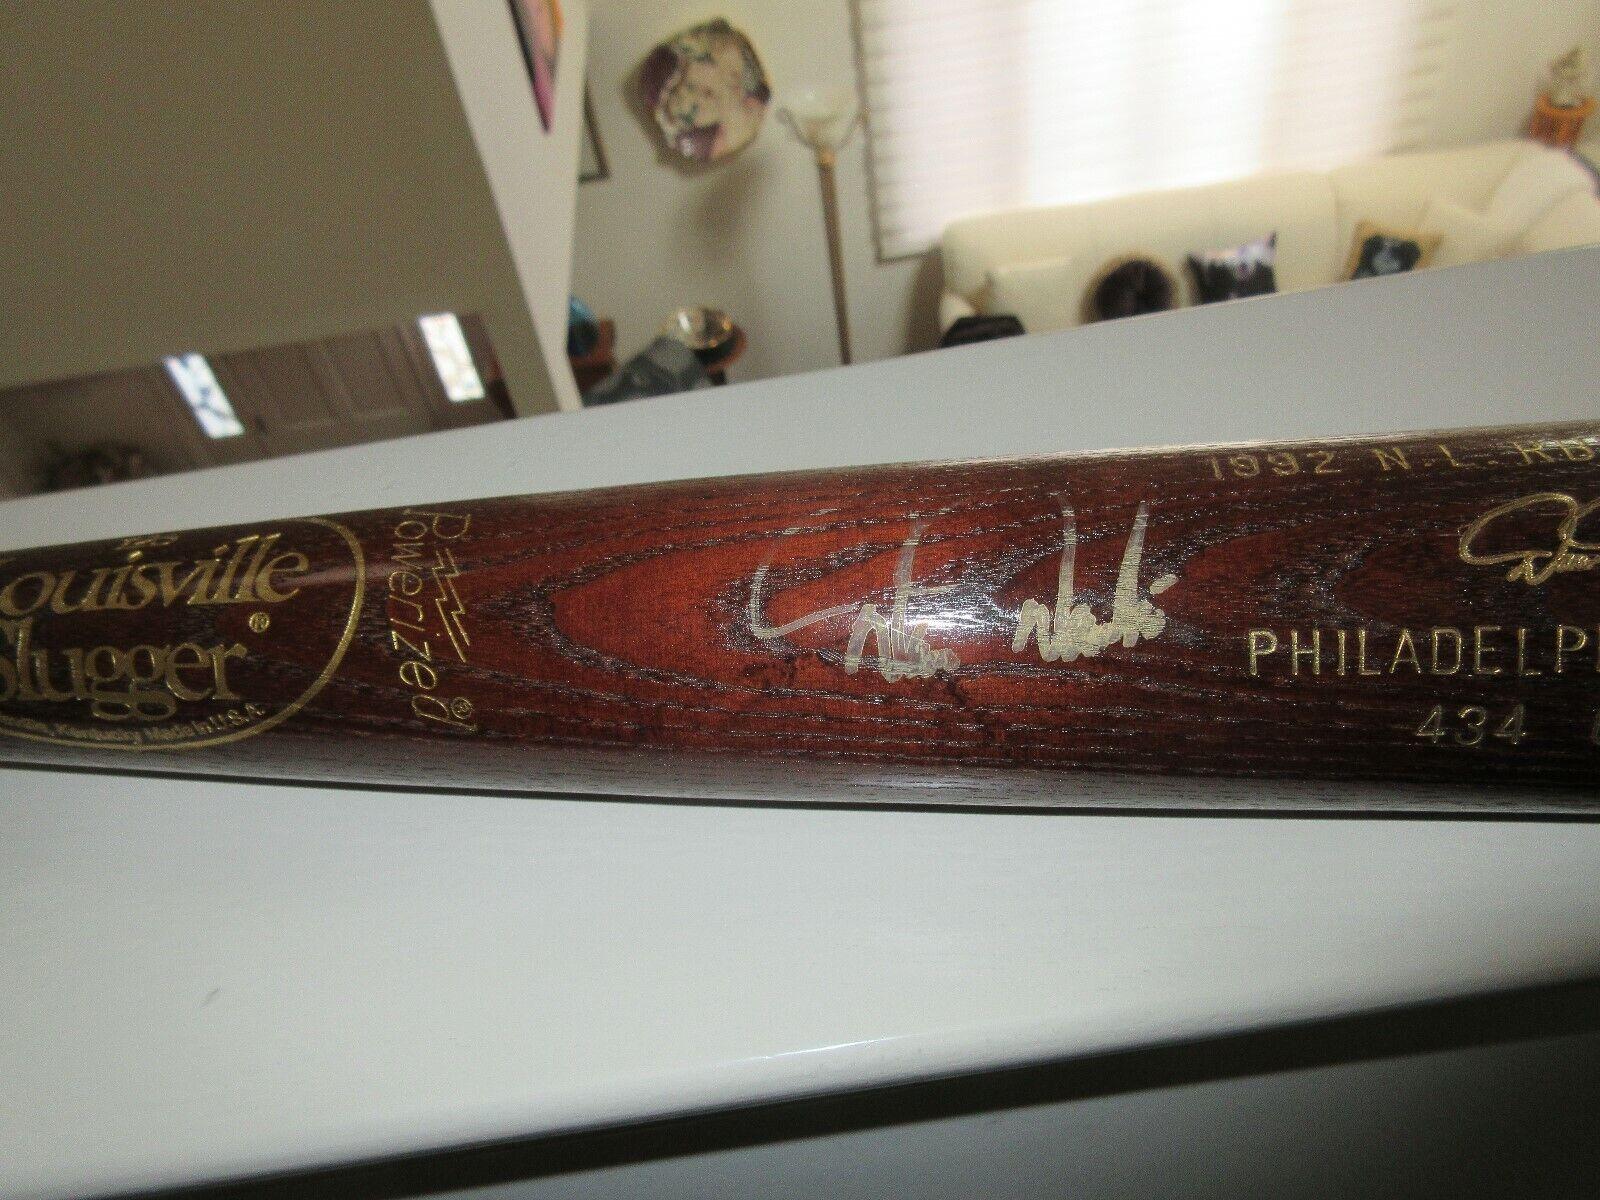 Philadelphia Phillies , Louisville Slugger Baseball Bat